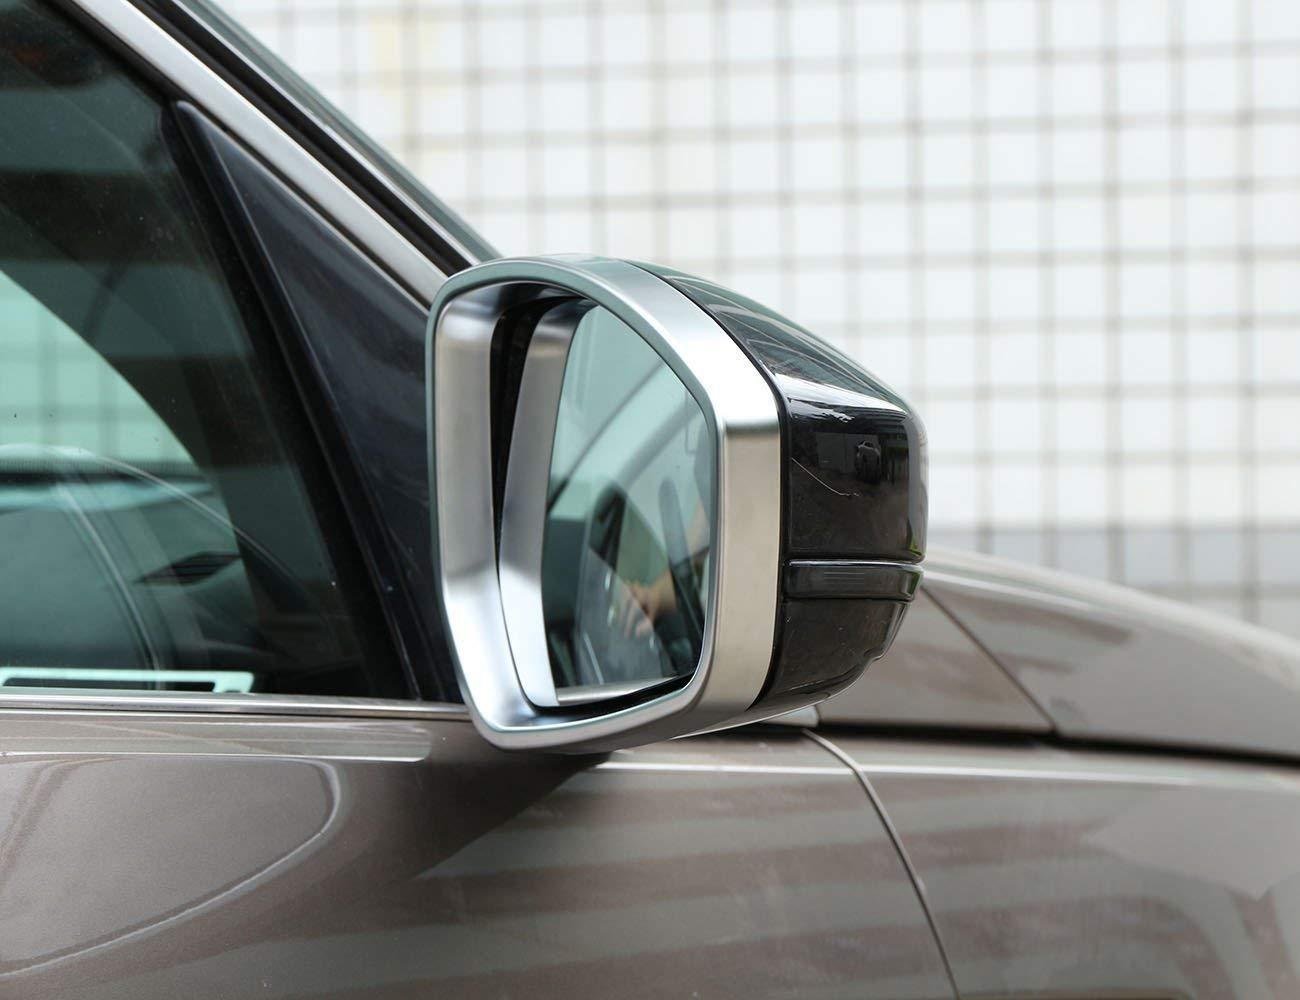 F-Pace X761 ABS Lateral Cromado Espejo retrovisor Marco Cubierta Accesorios para Evoque 2014-2017